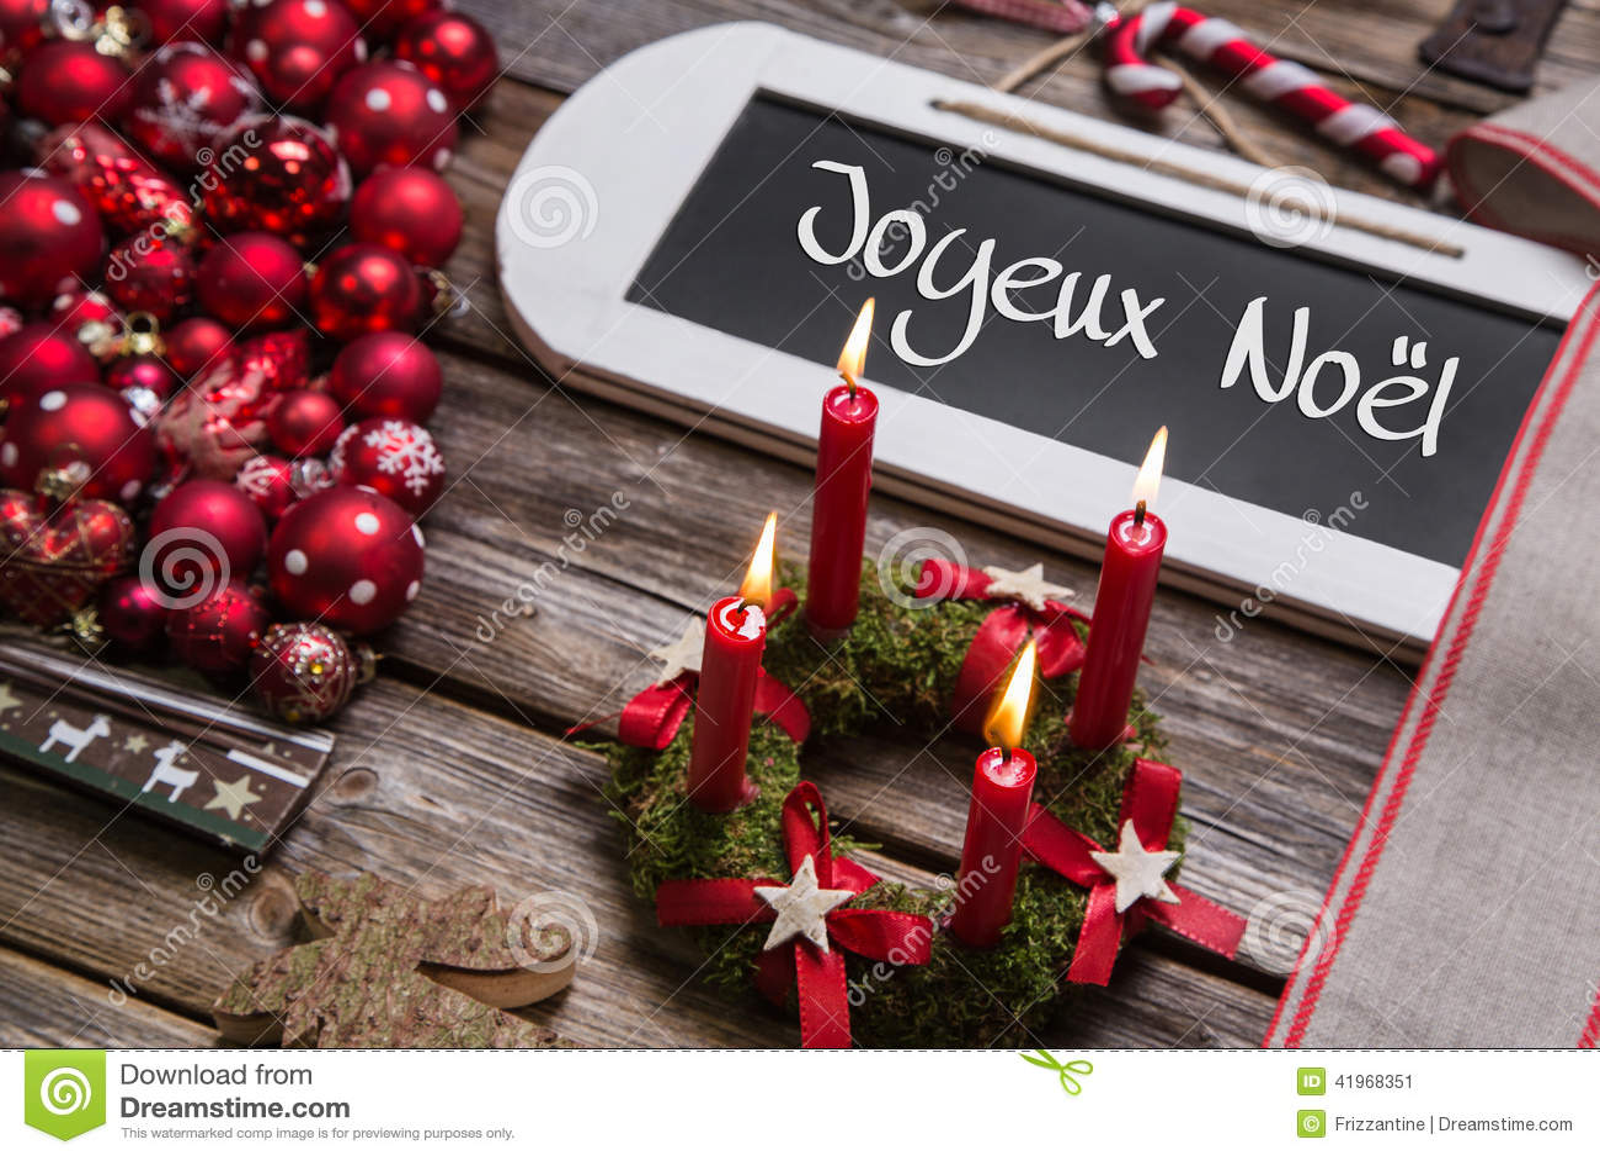 Auguri Matrimonio Francese : Cartolina di natale francese con quattro candele brucianti